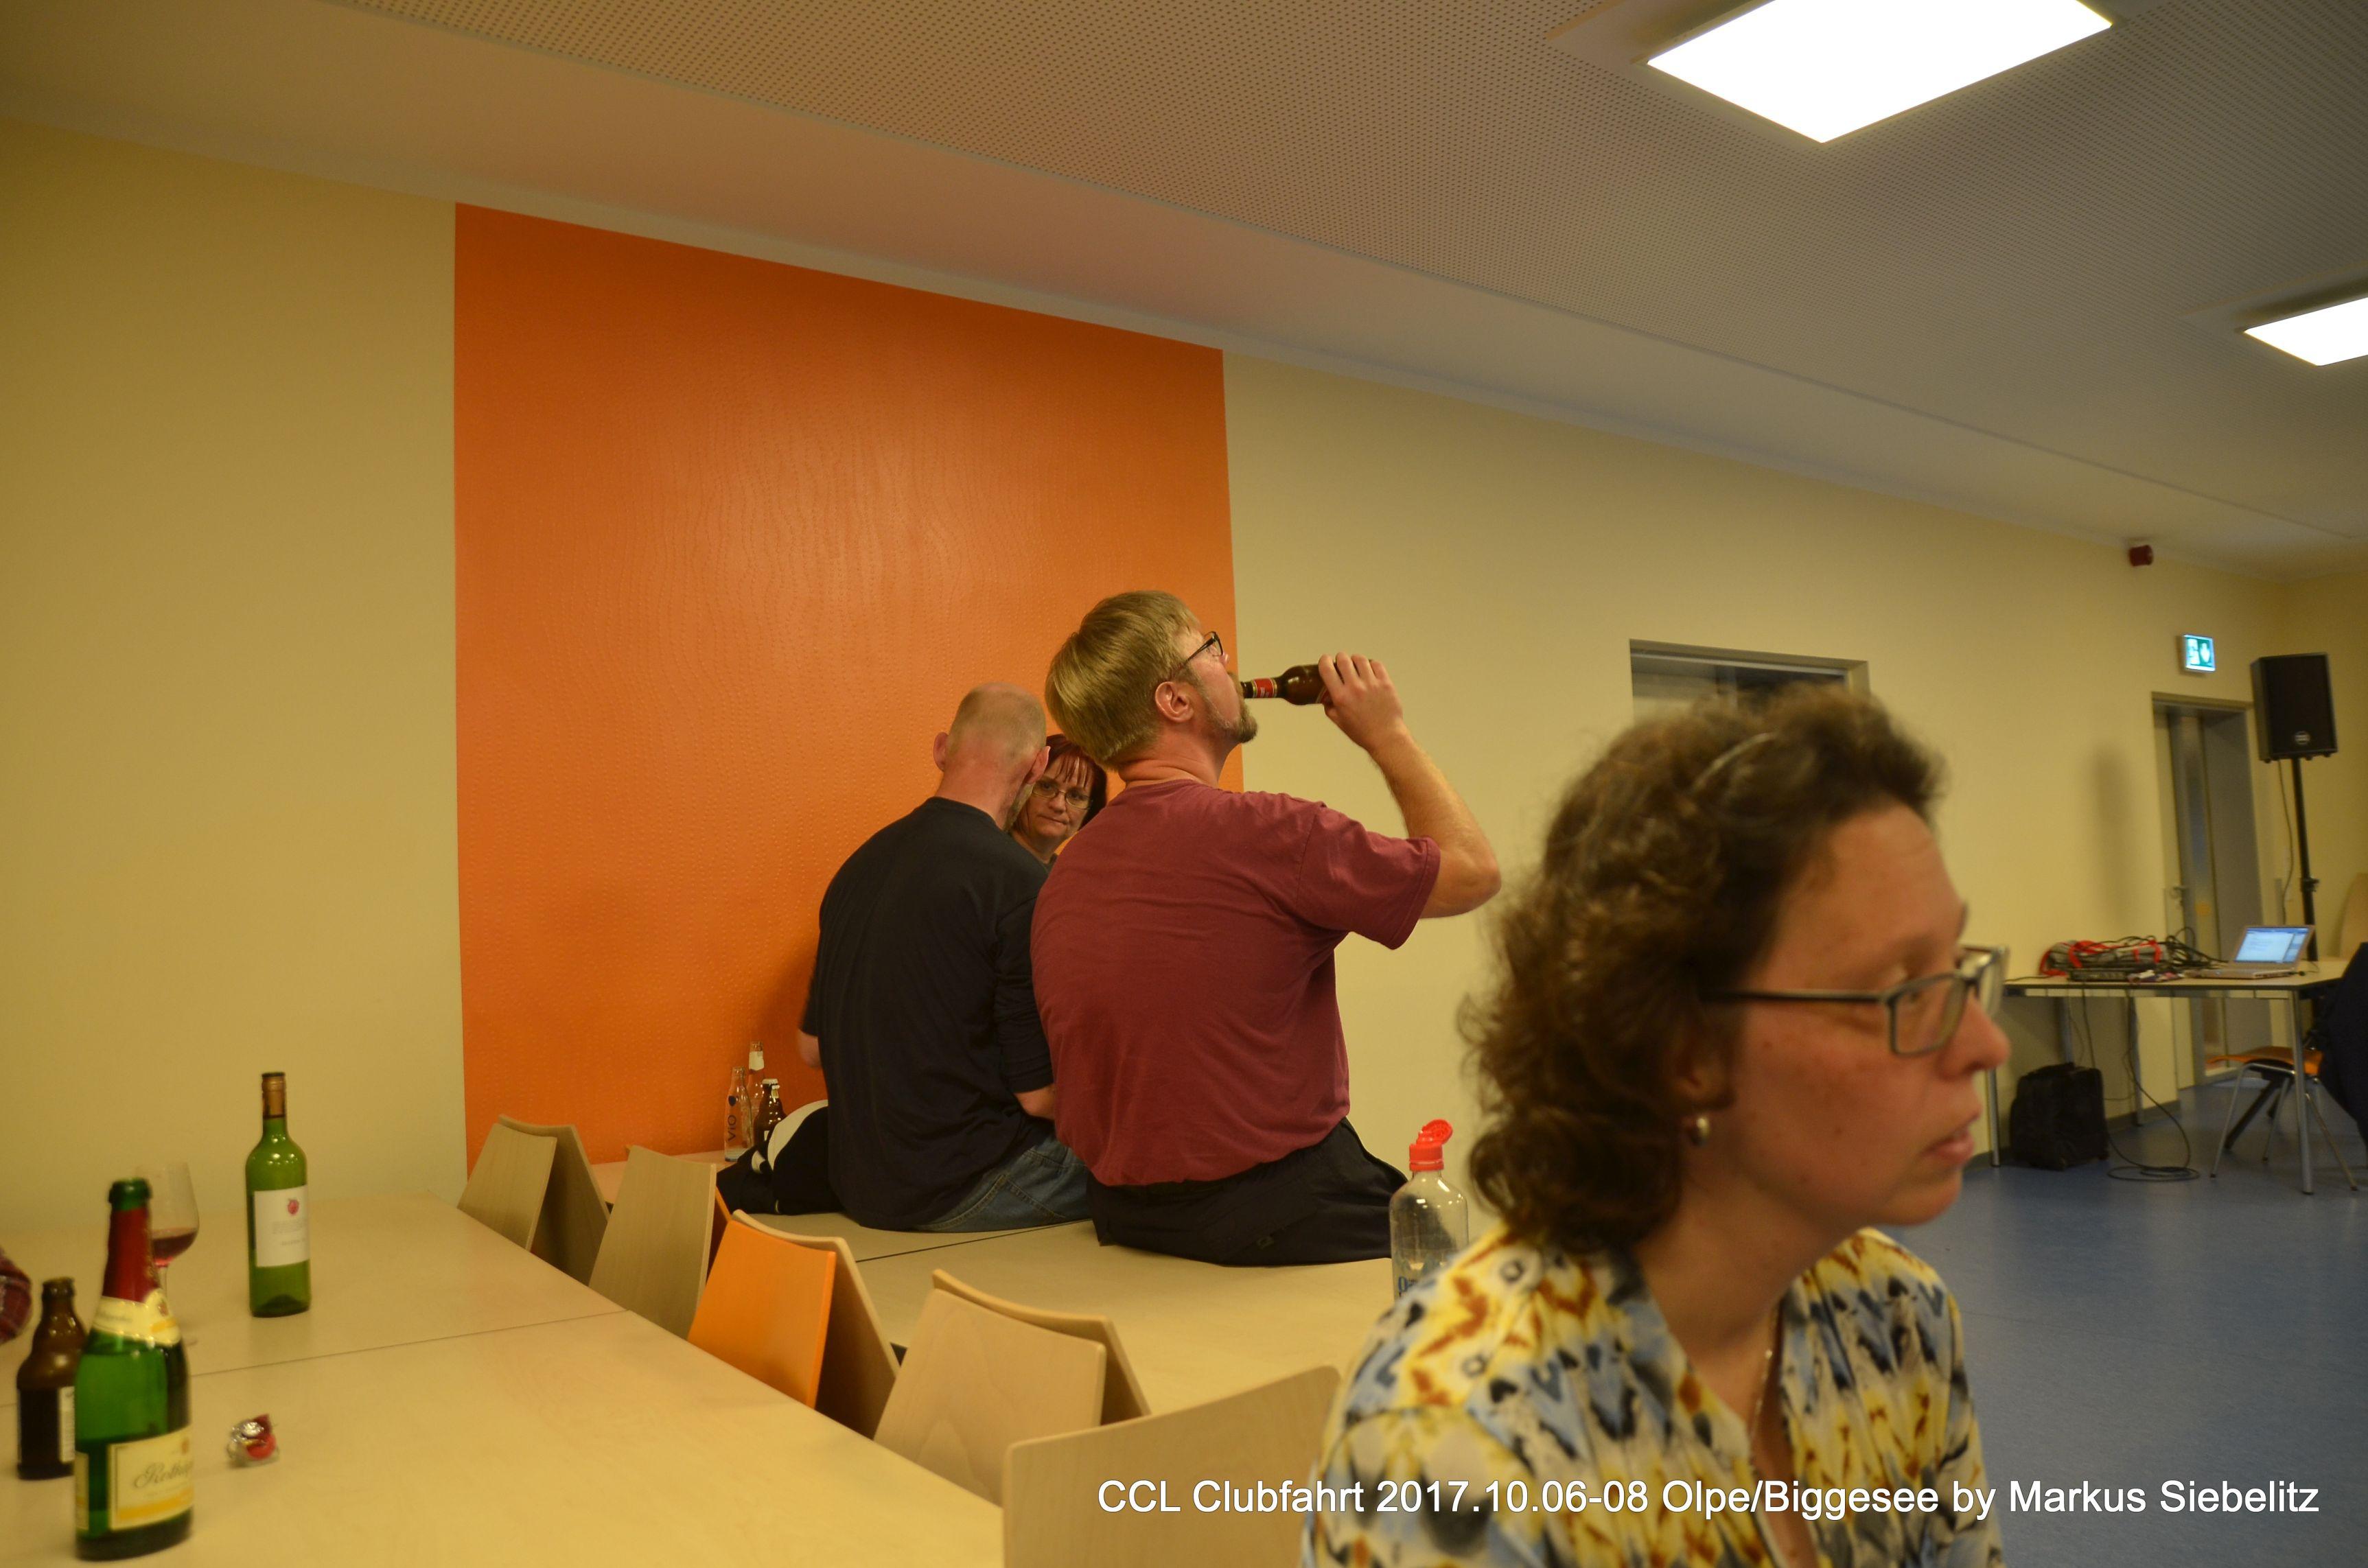 CCL Clubfahrt 2017.10.06-08 Biggesee (16)